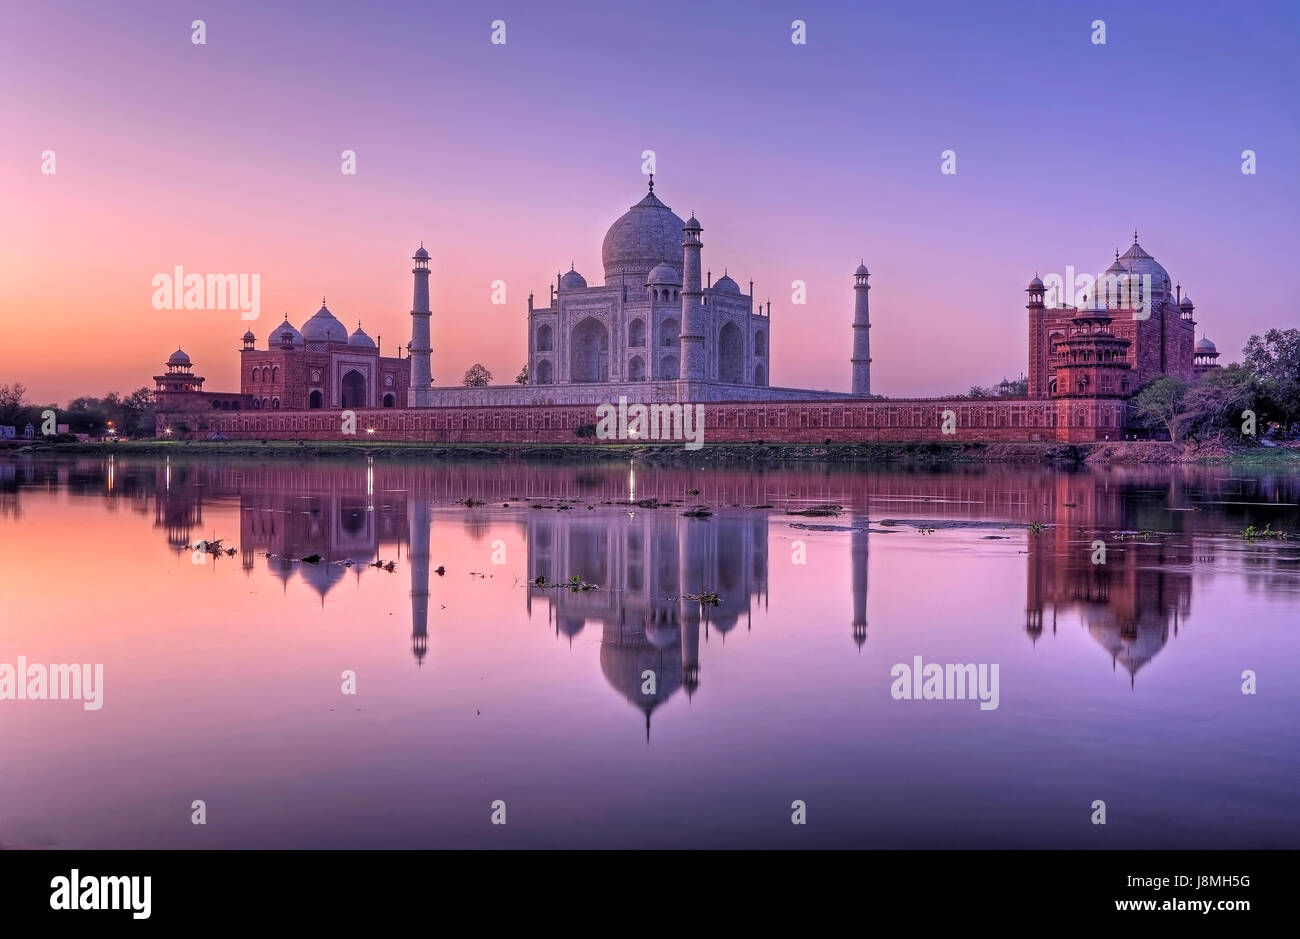 Taj Mahal, Agra, Uttar Pradesh, India. - Stock Image